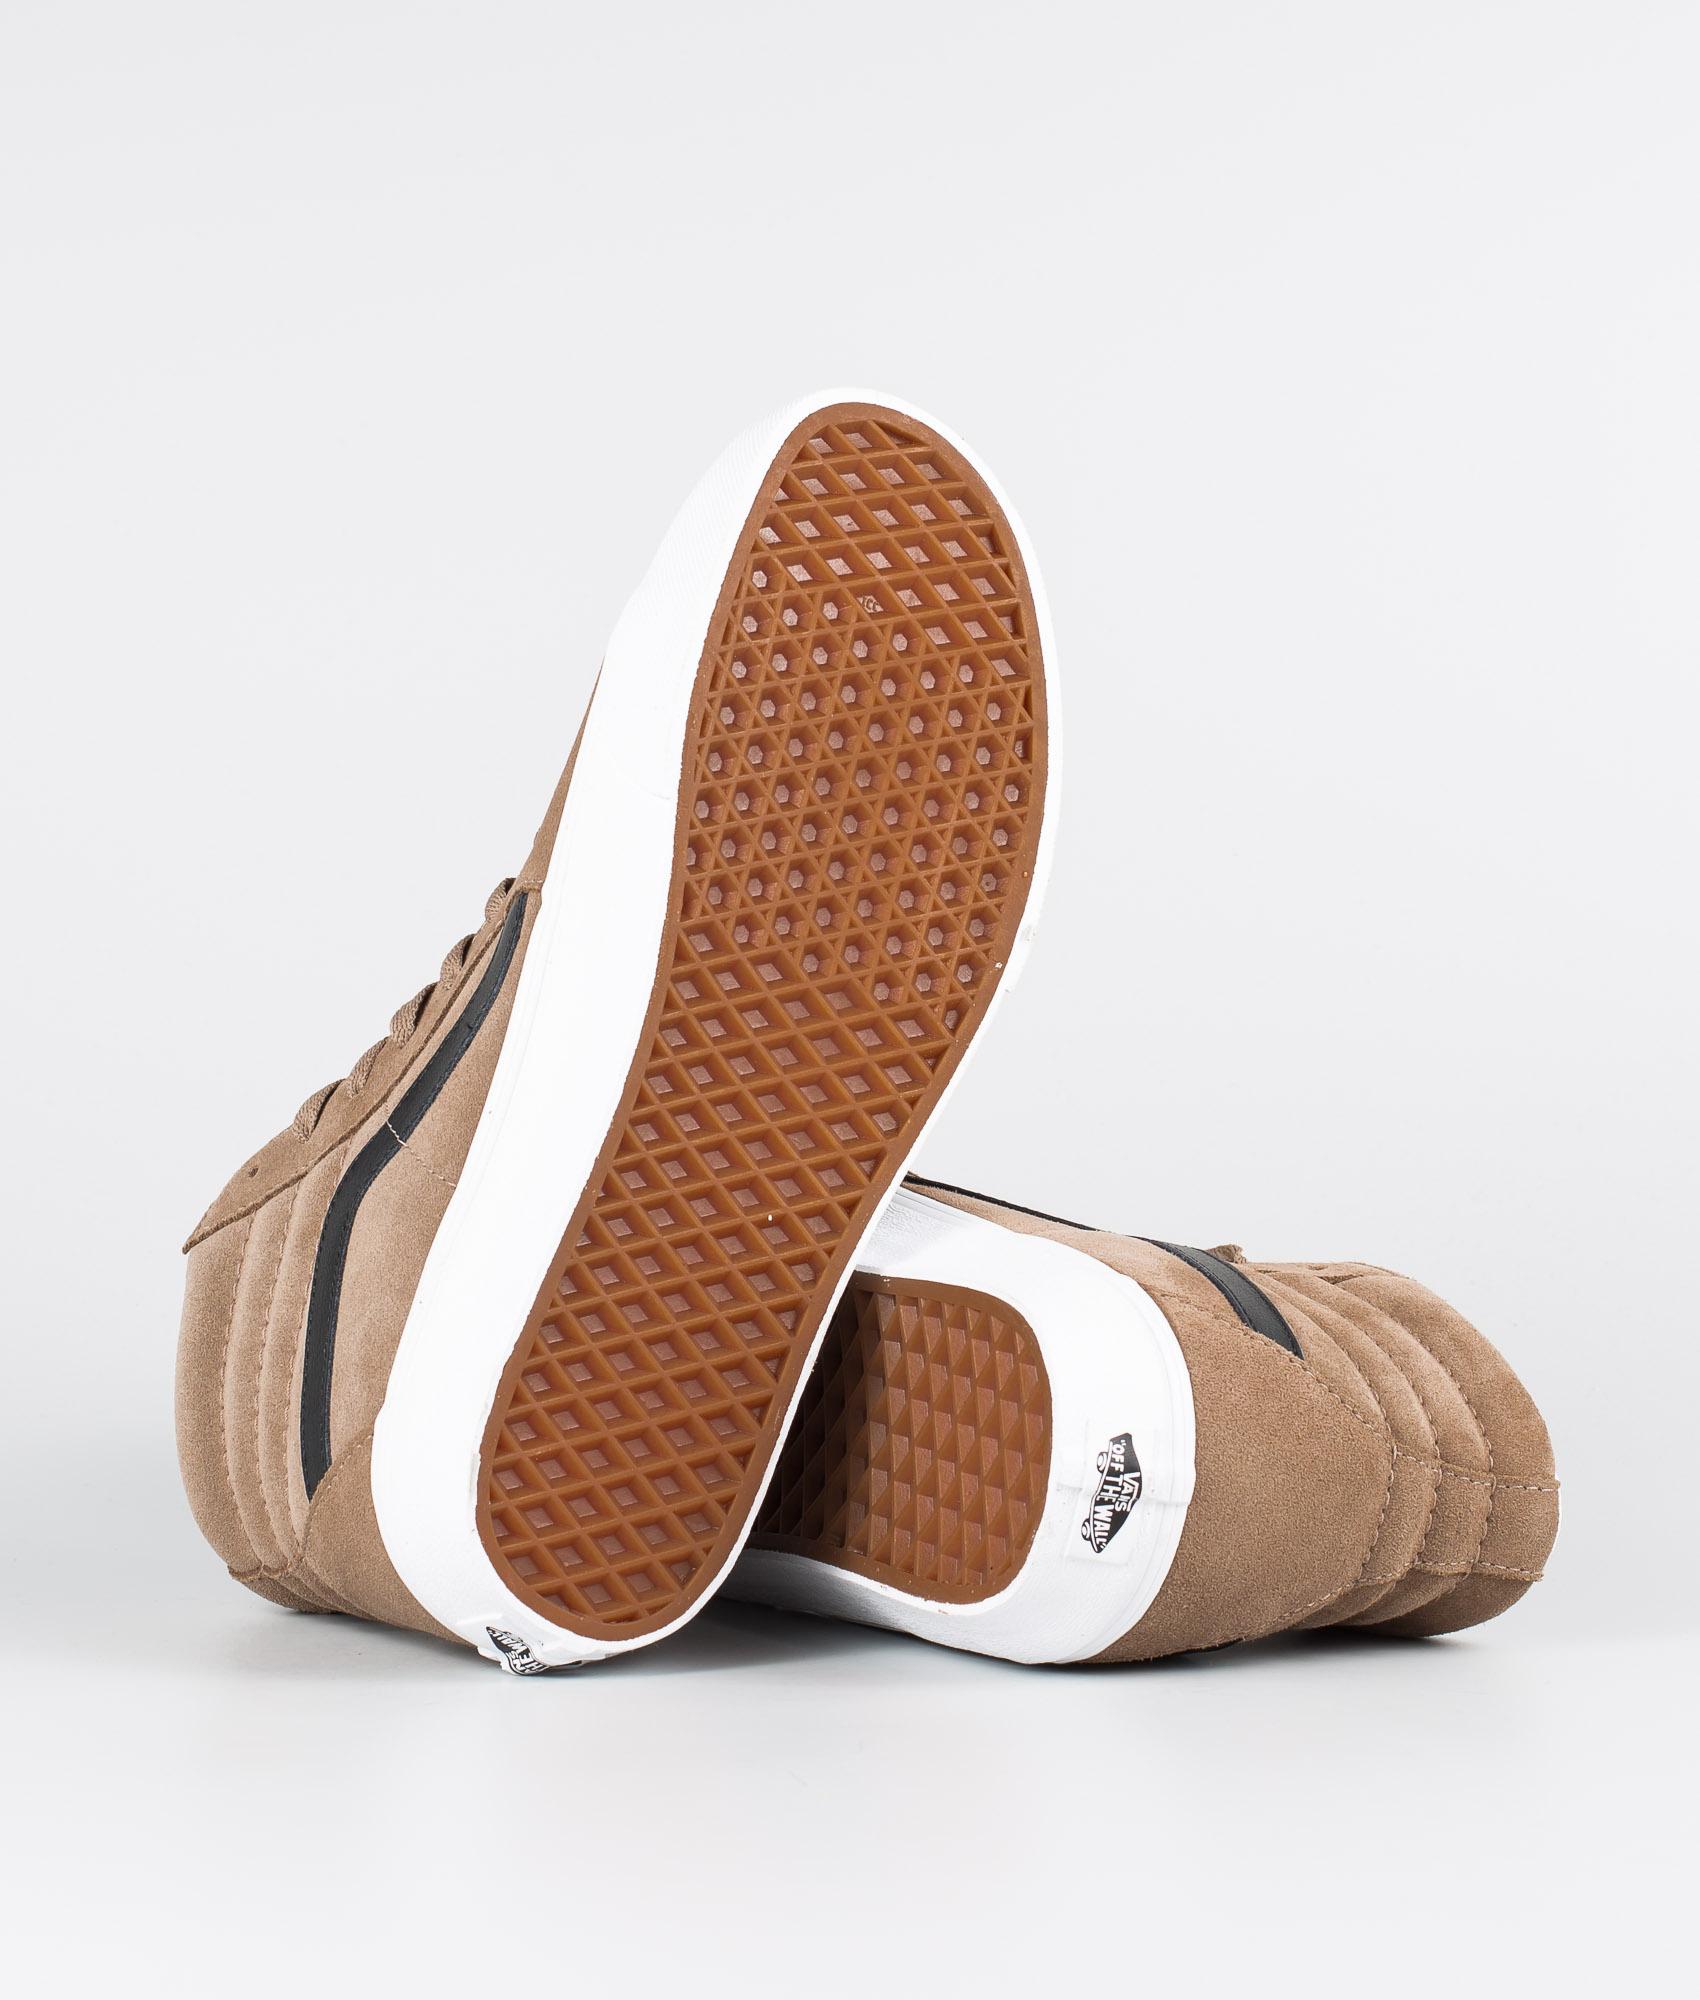 Vans Sk8 Hi Schuhe (Suede) PortabellaTrue White